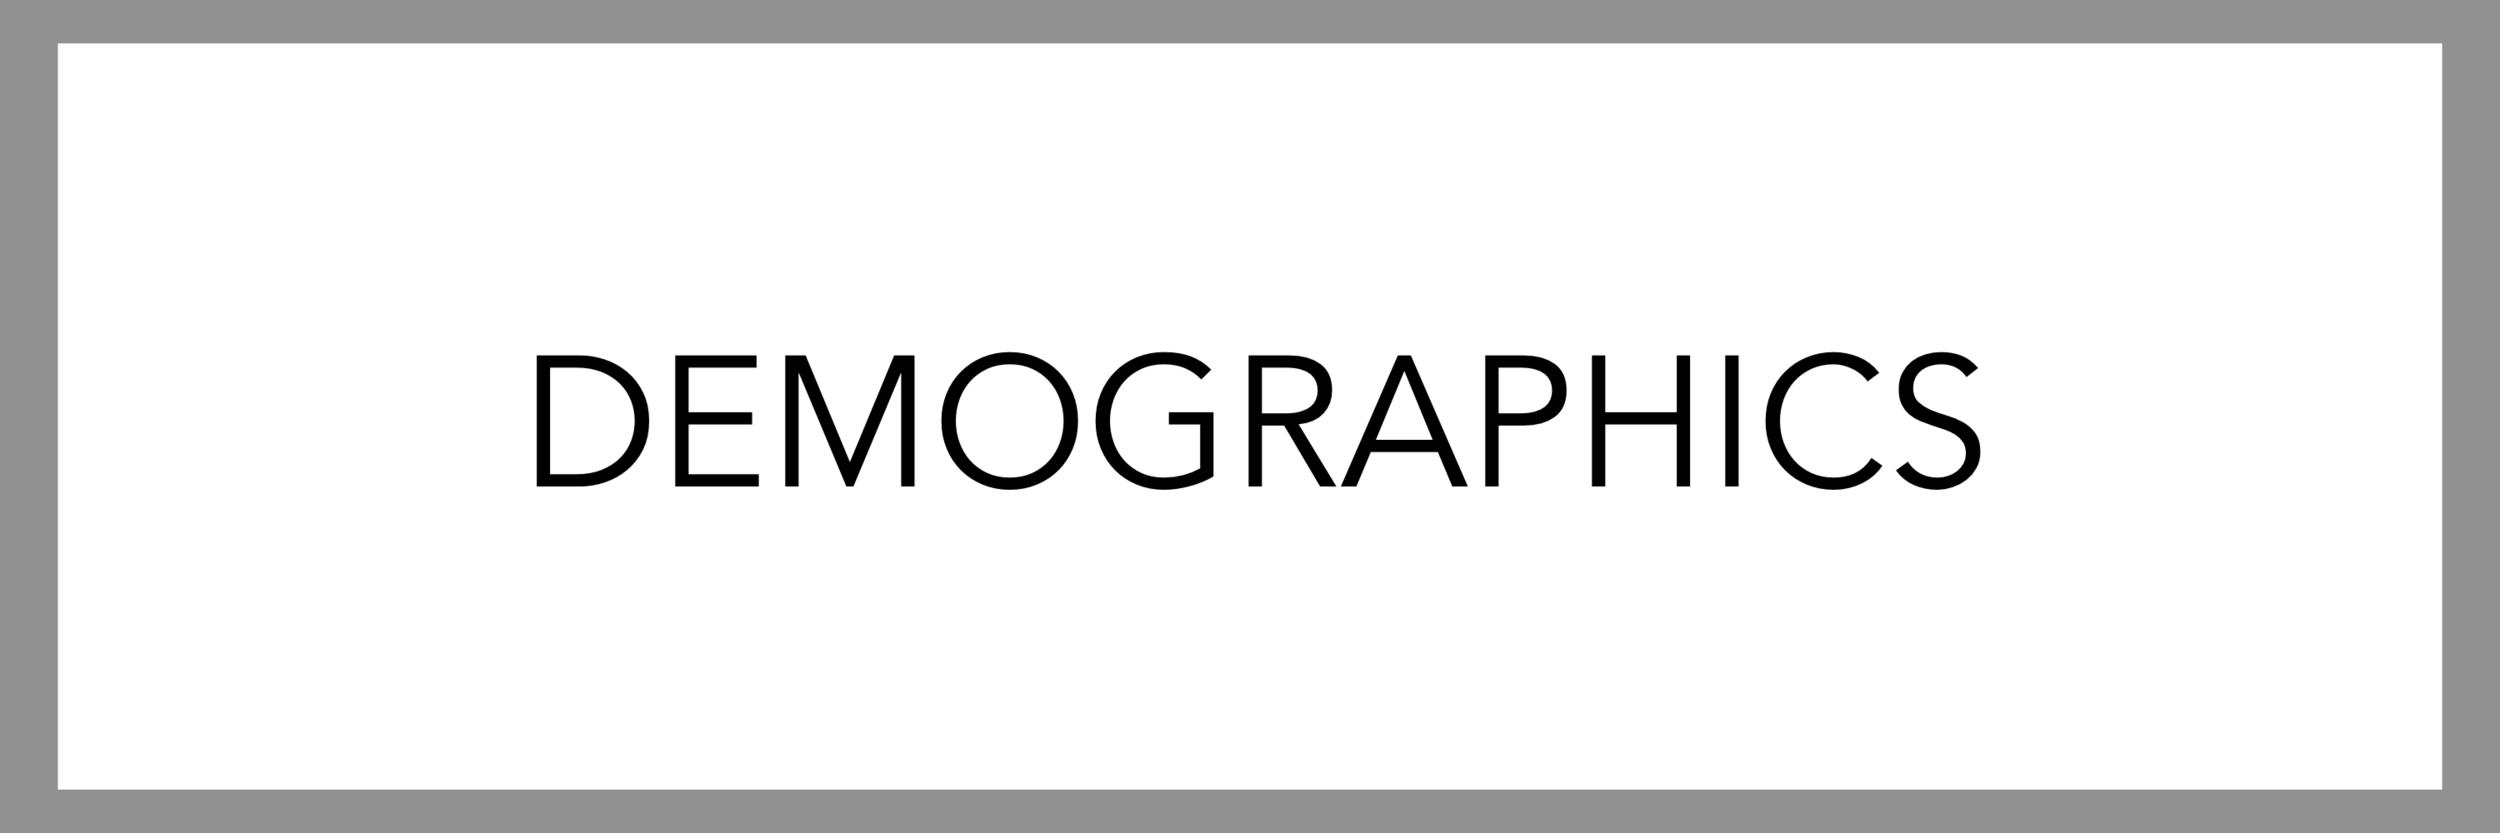 session DEMOGRAPHICS.png